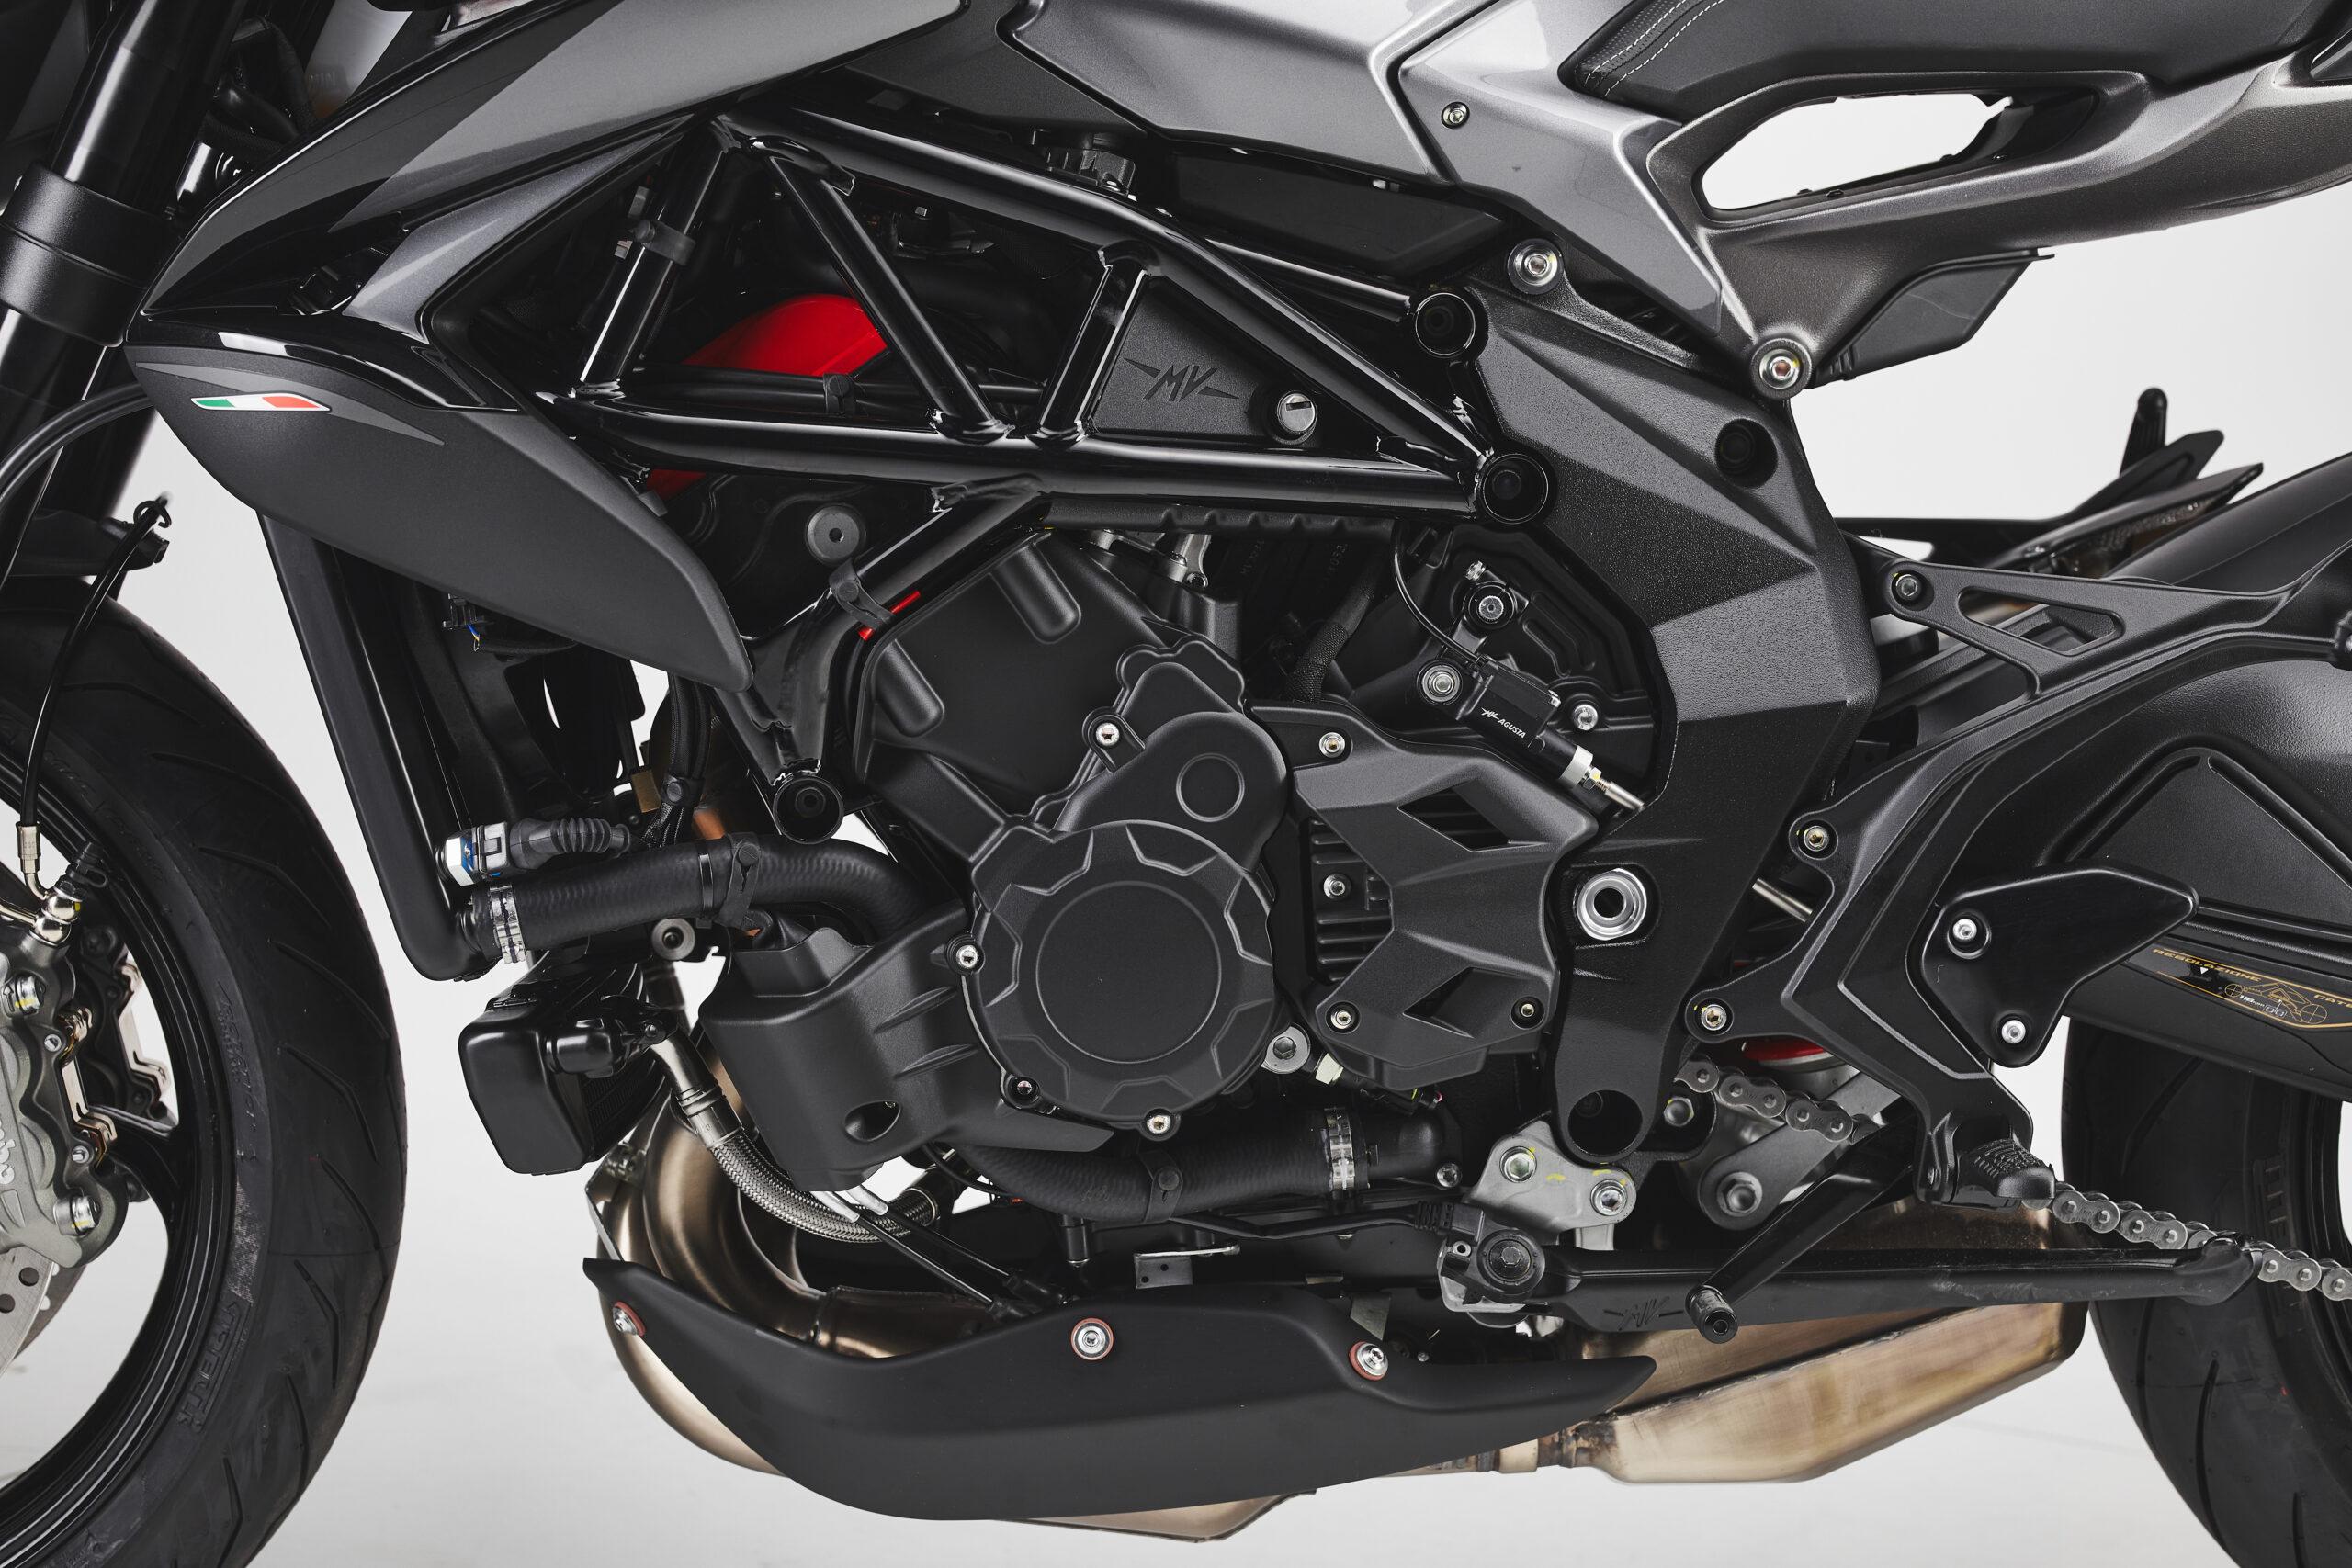 MV Agusta Brutale RR engine